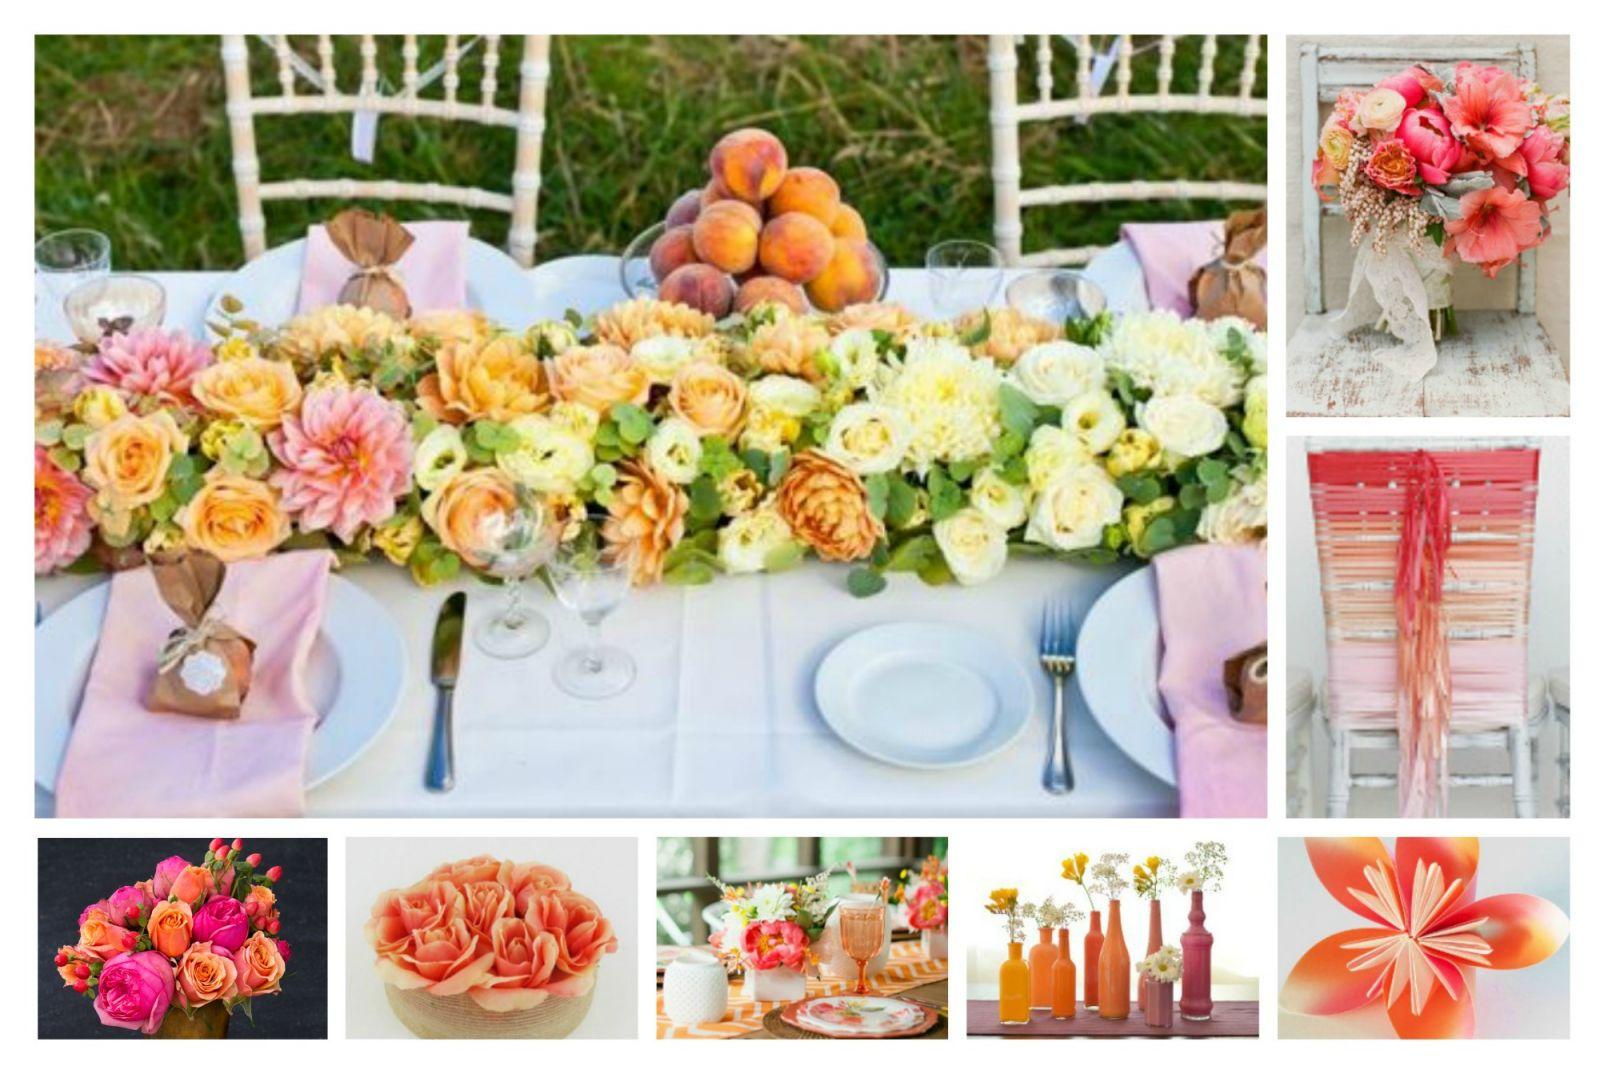 Wedding Color Schemes: Pink, Coral, And Orange